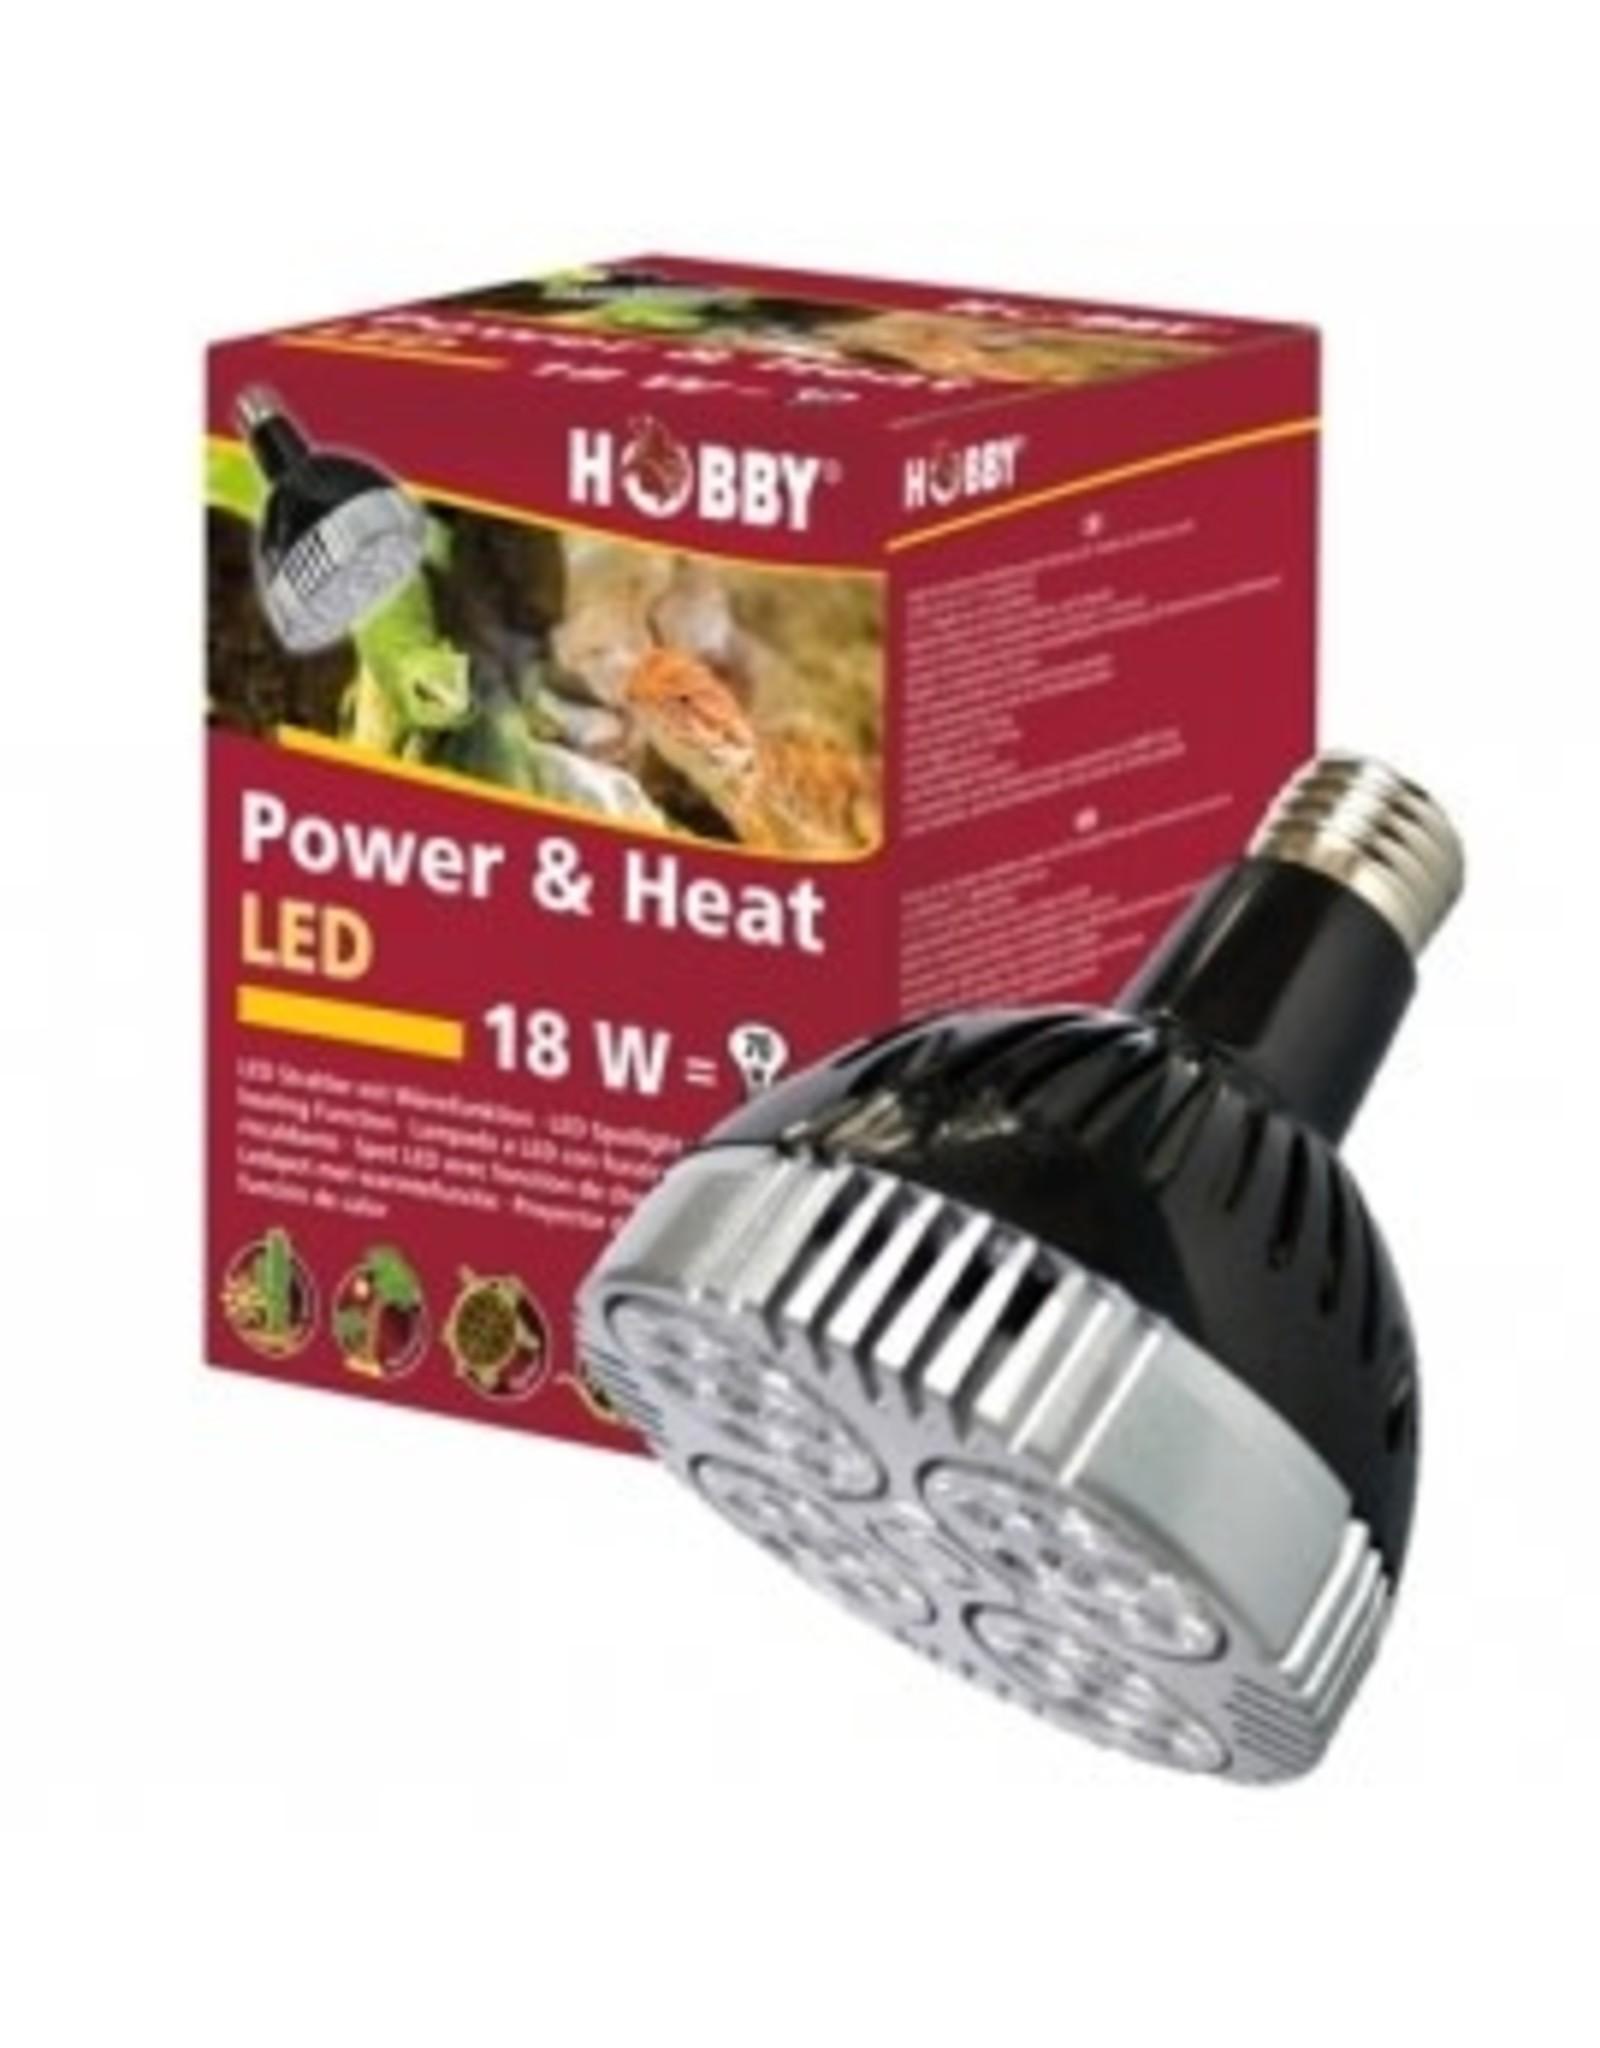 Hobby AMPOULE POWER & HEAT LED